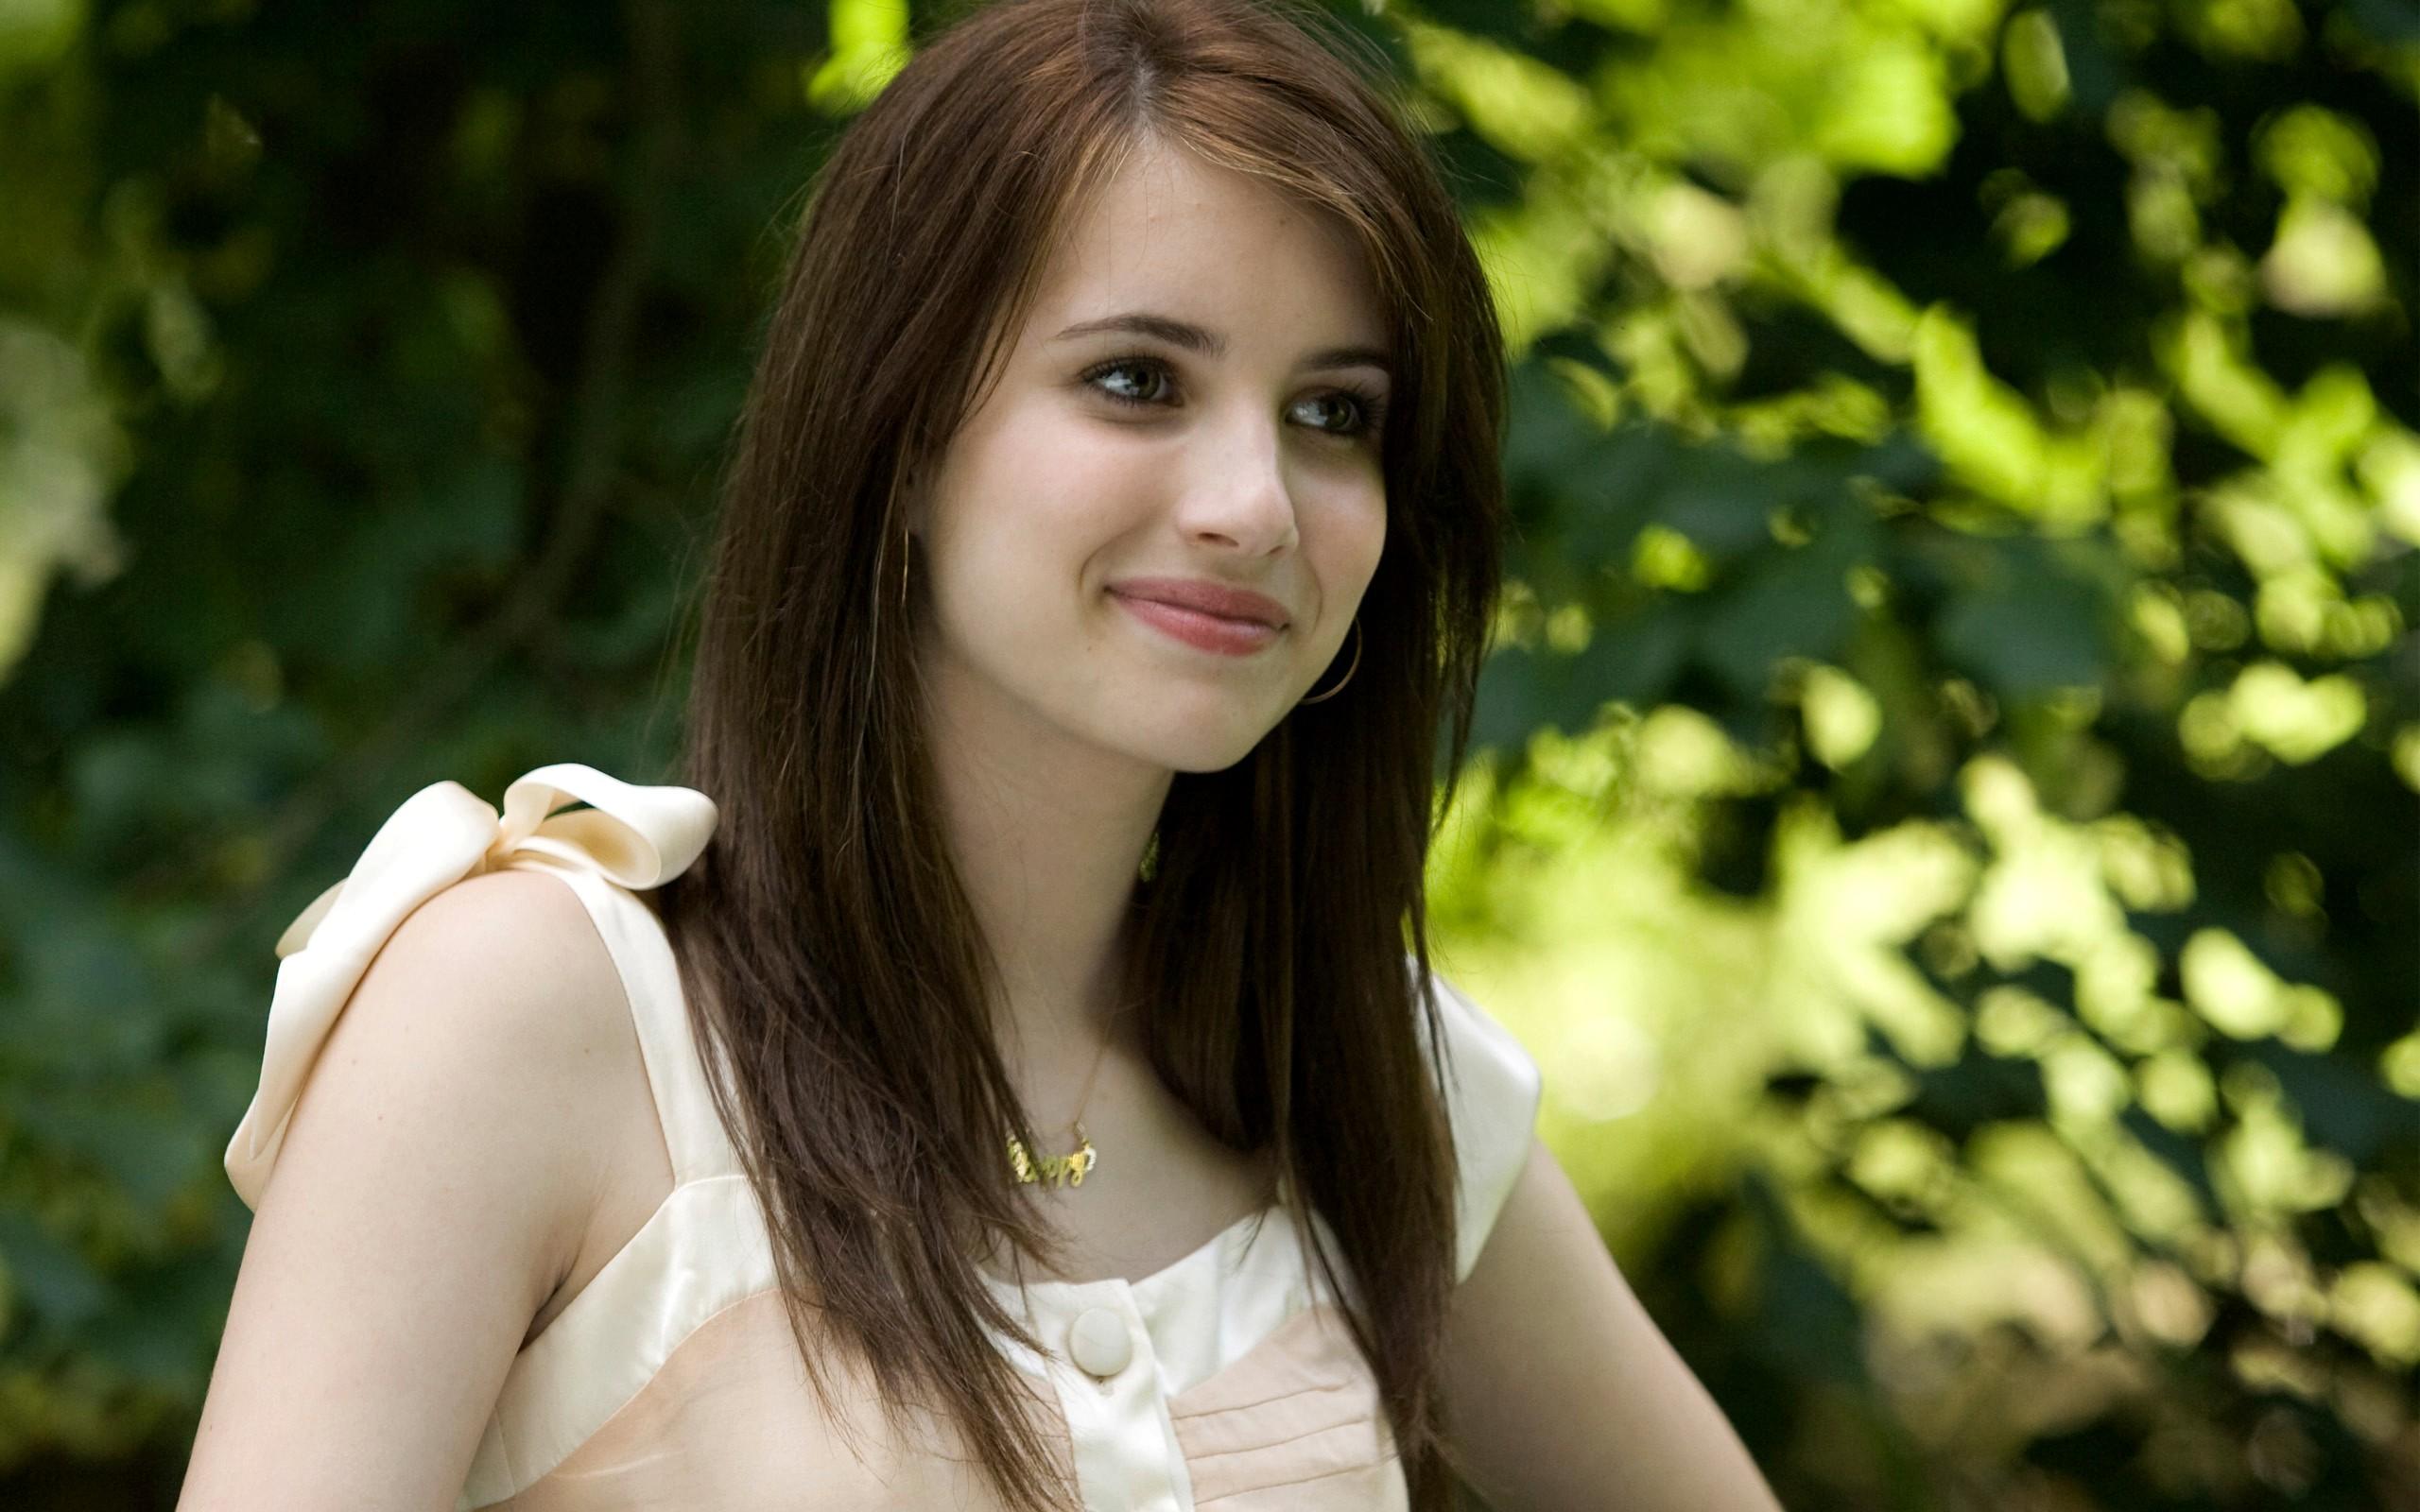 Movietube beautiful girl — pic 1